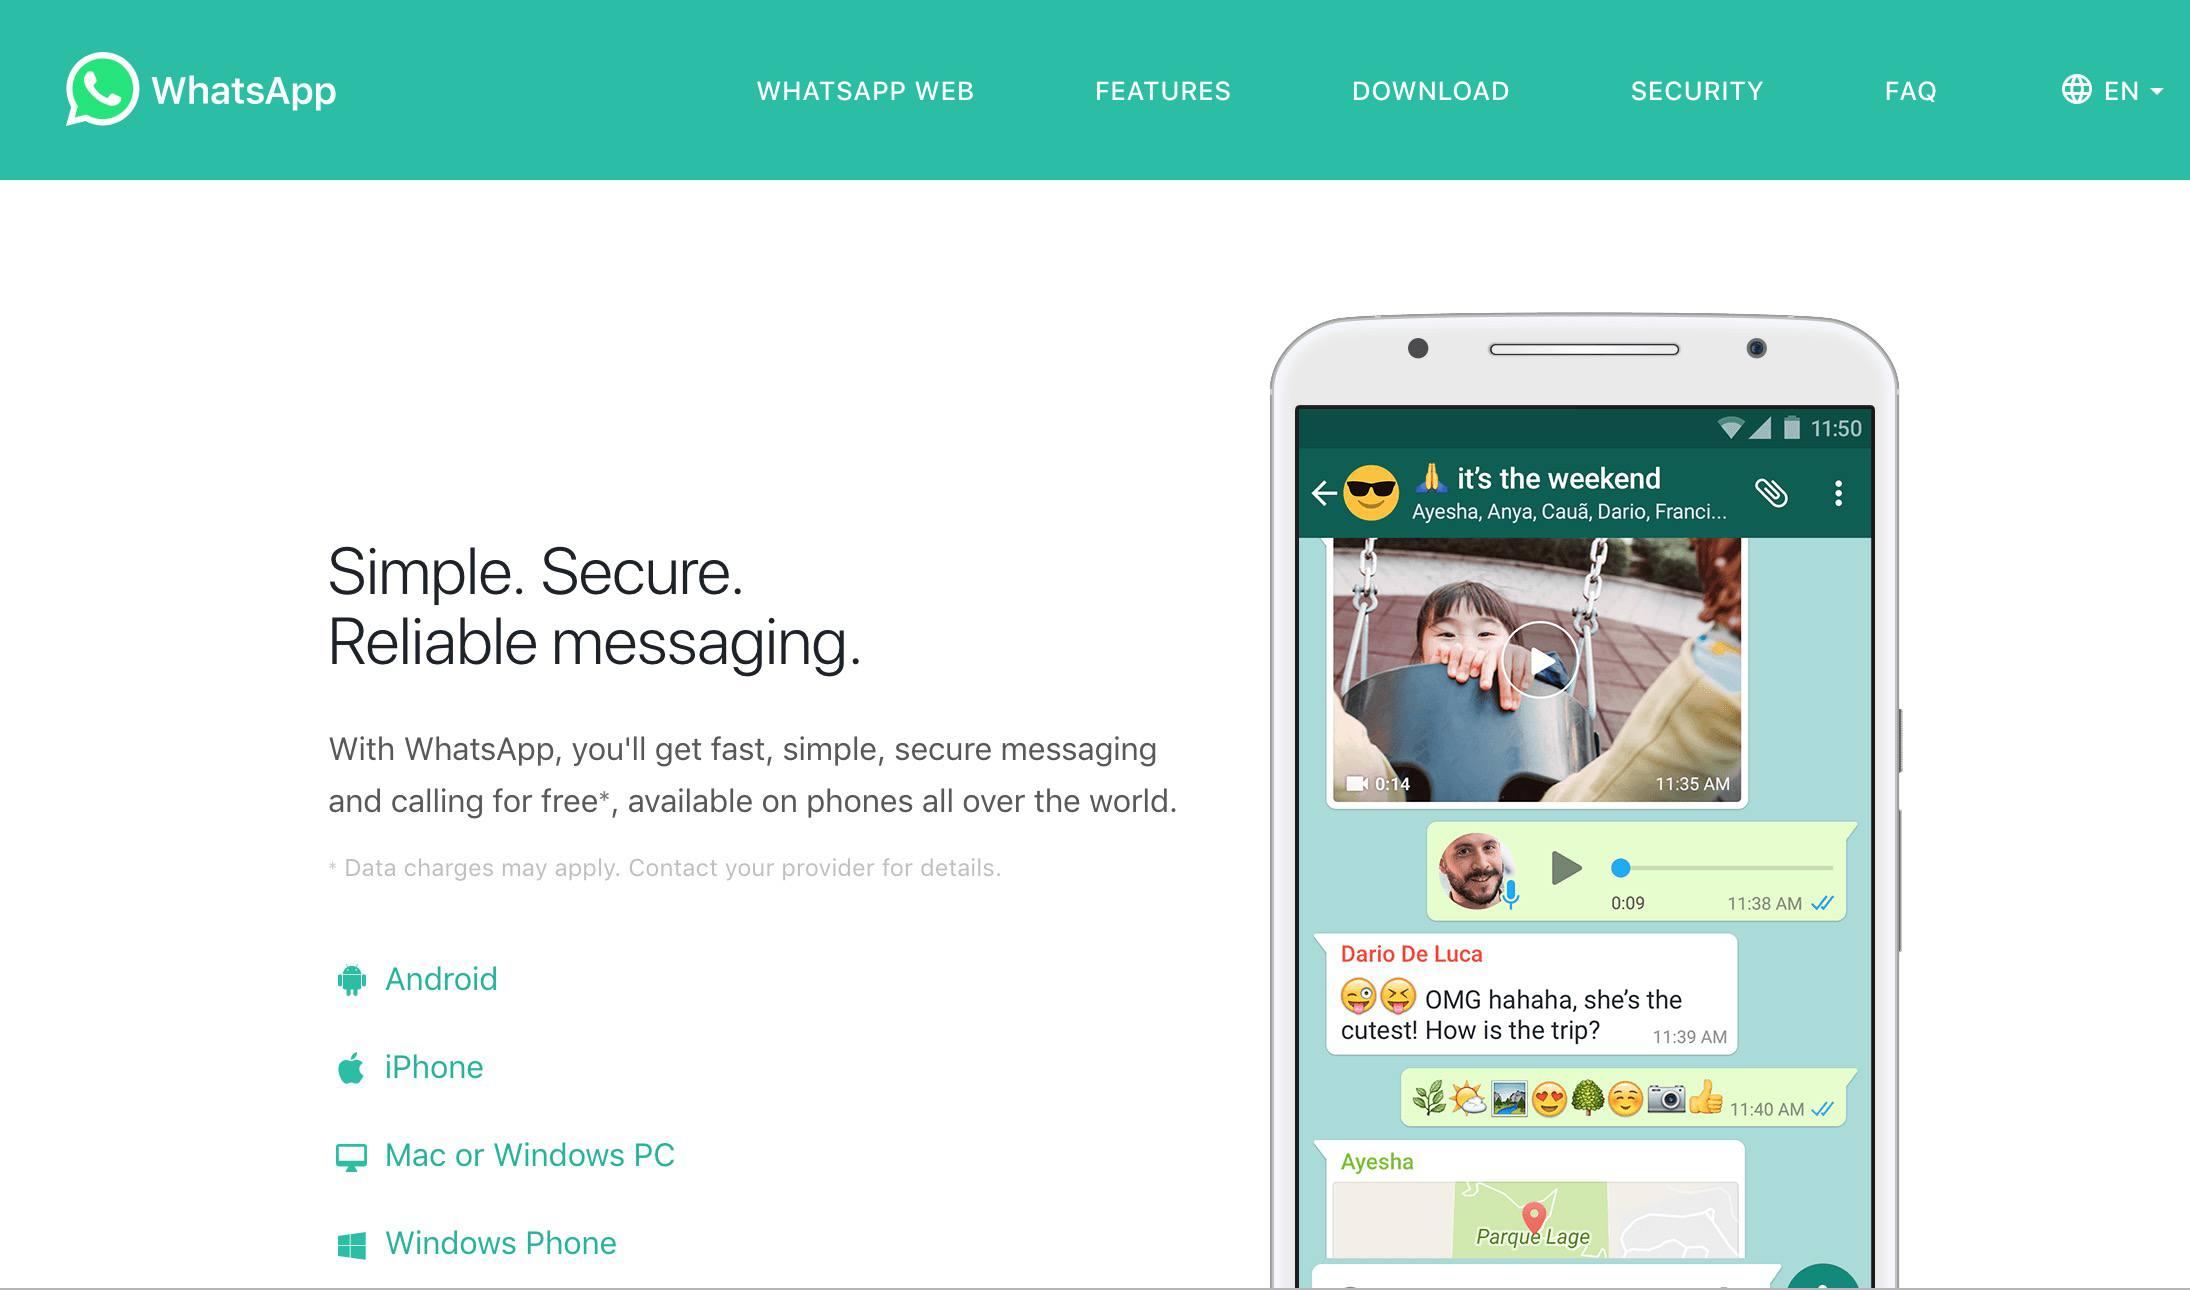 WhatsApp web site